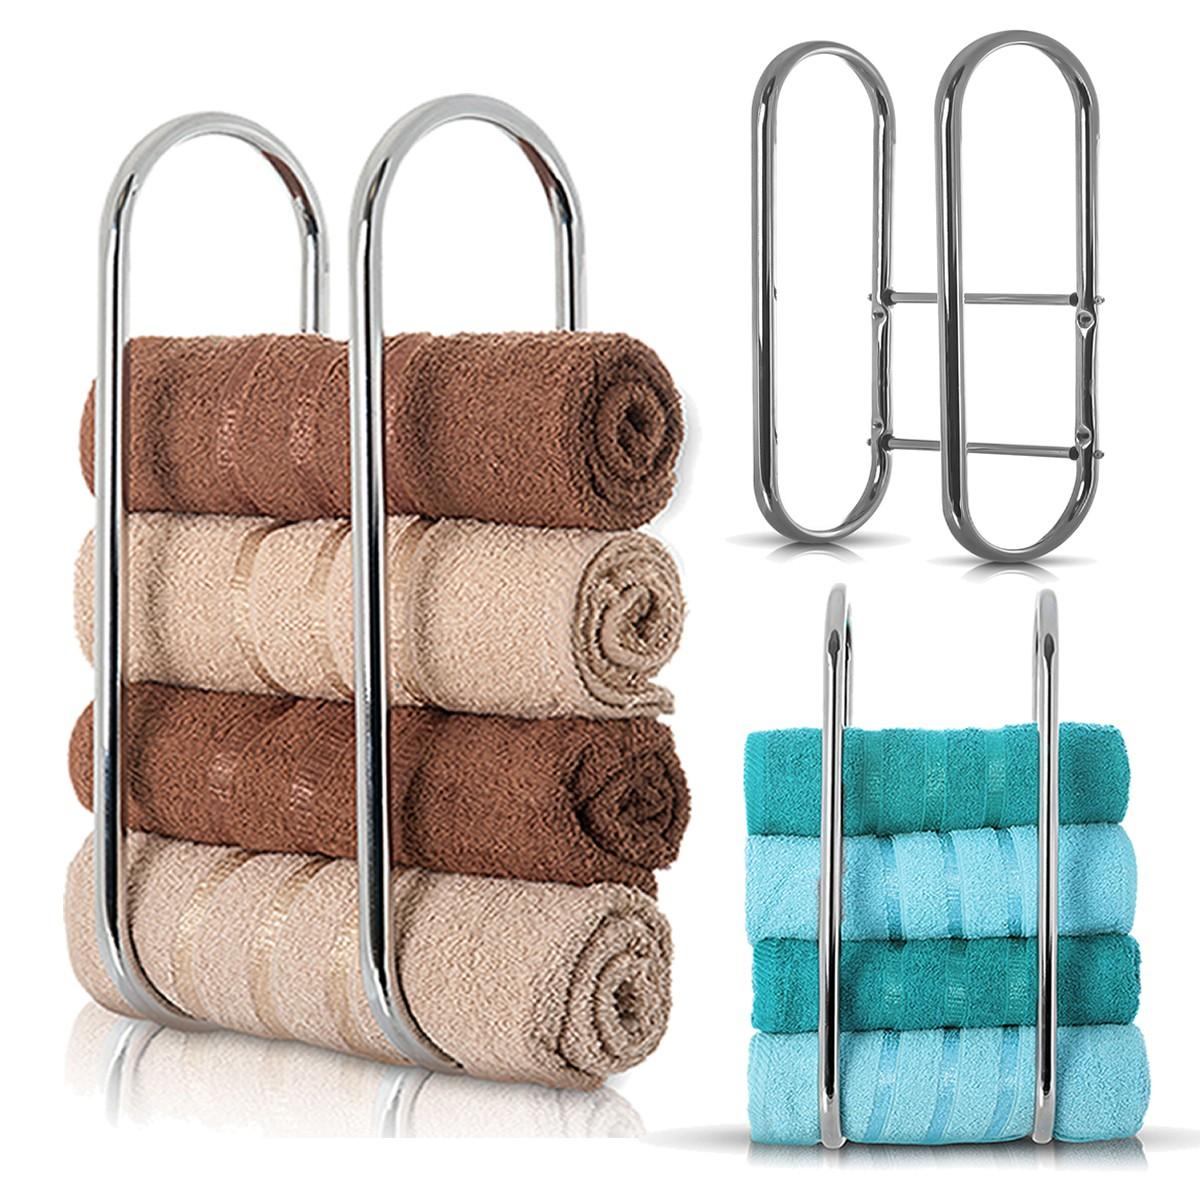 Wall Mounted Chrome Towel Holder Shelf Bathroom Storage